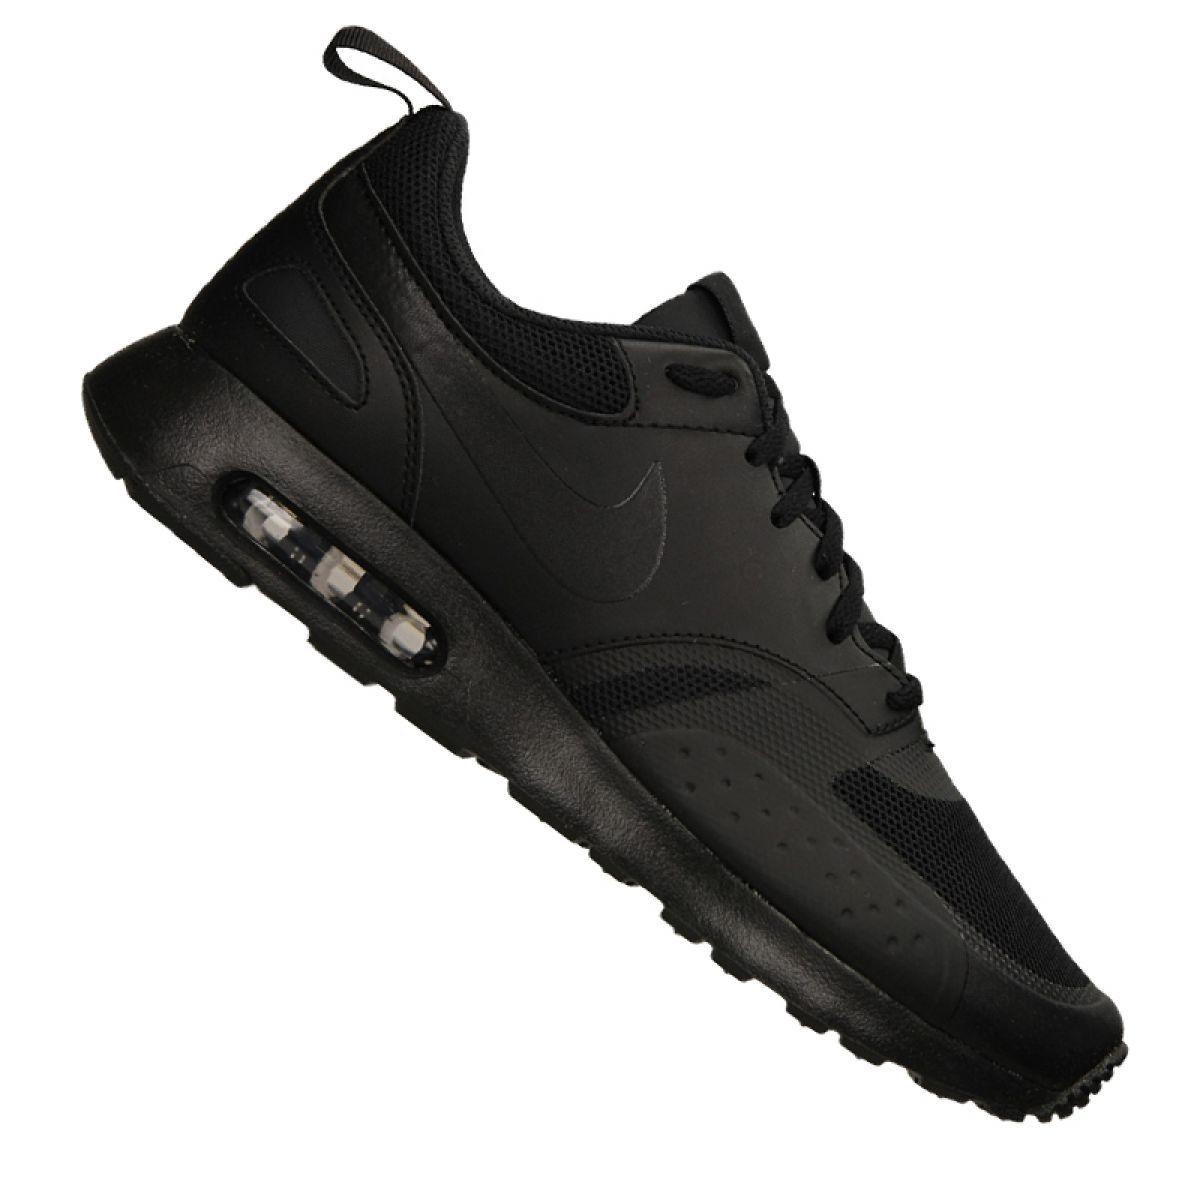 Nike Air Max Vision M 918230 001 shoes black | Nike air max